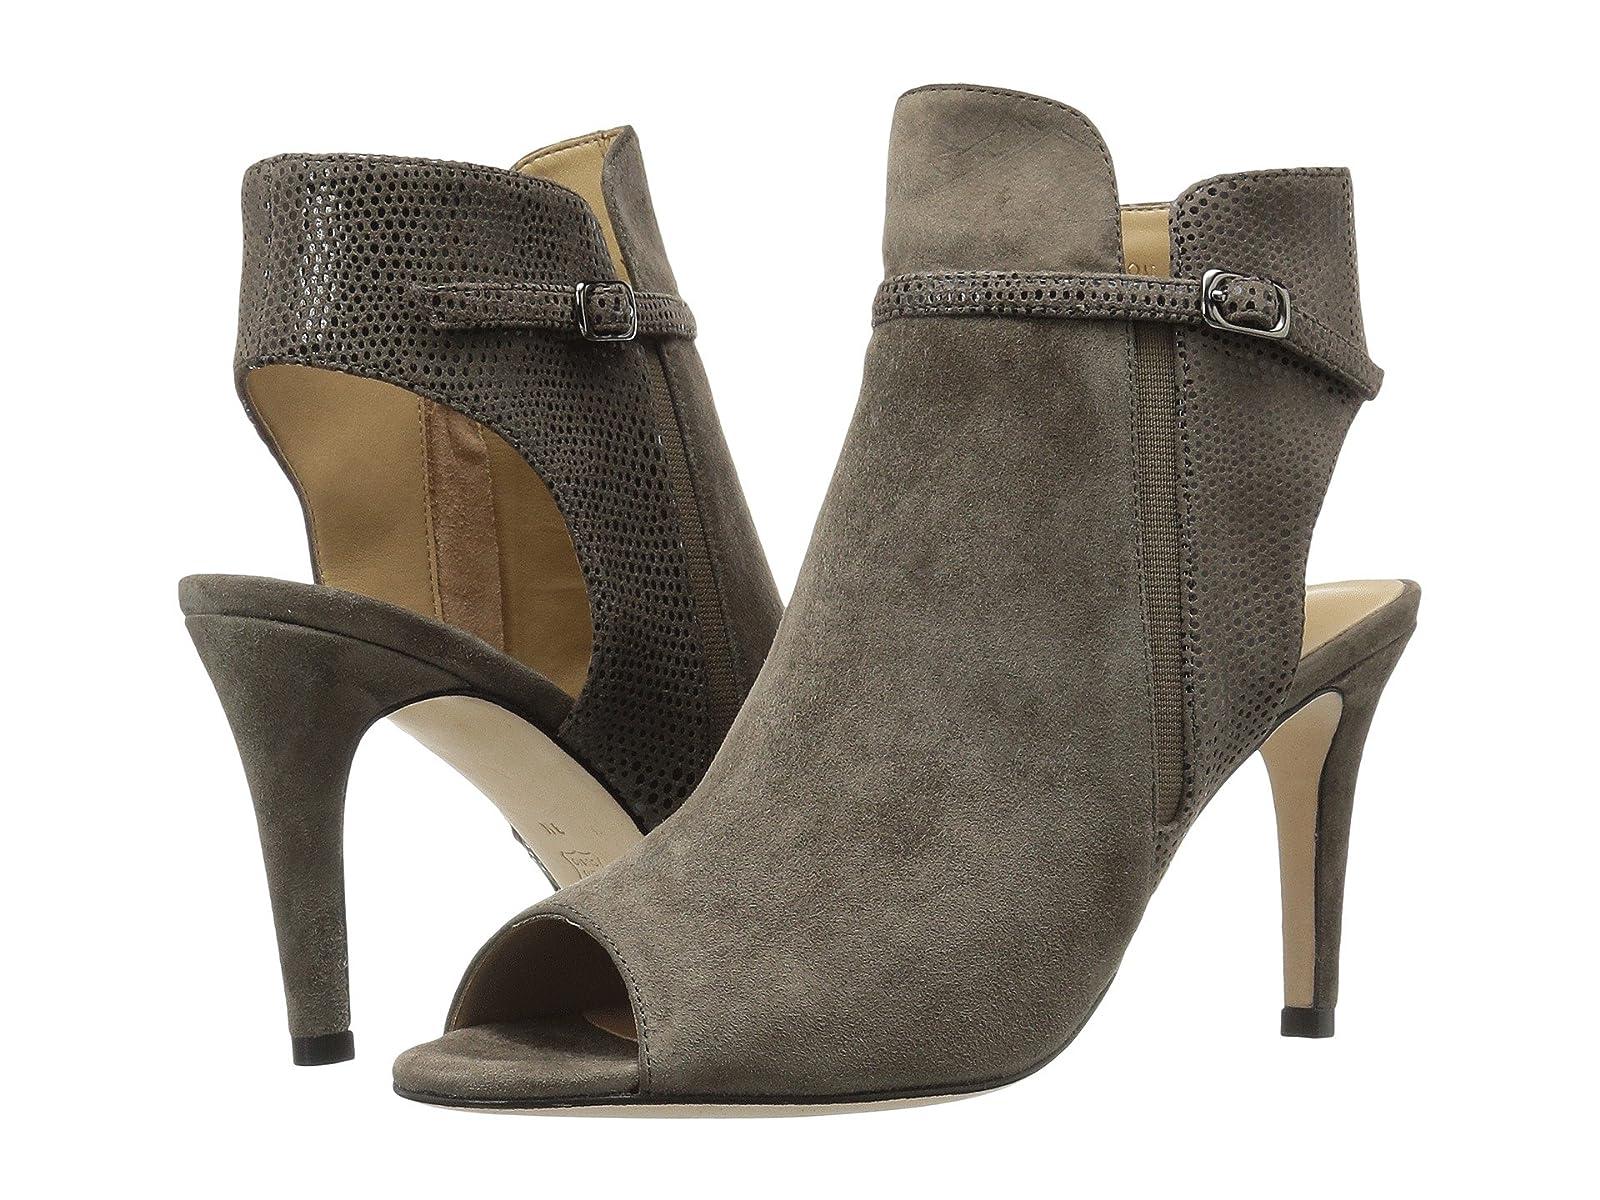 Vaneli BirgitCheap and distinctive eye-catching shoes